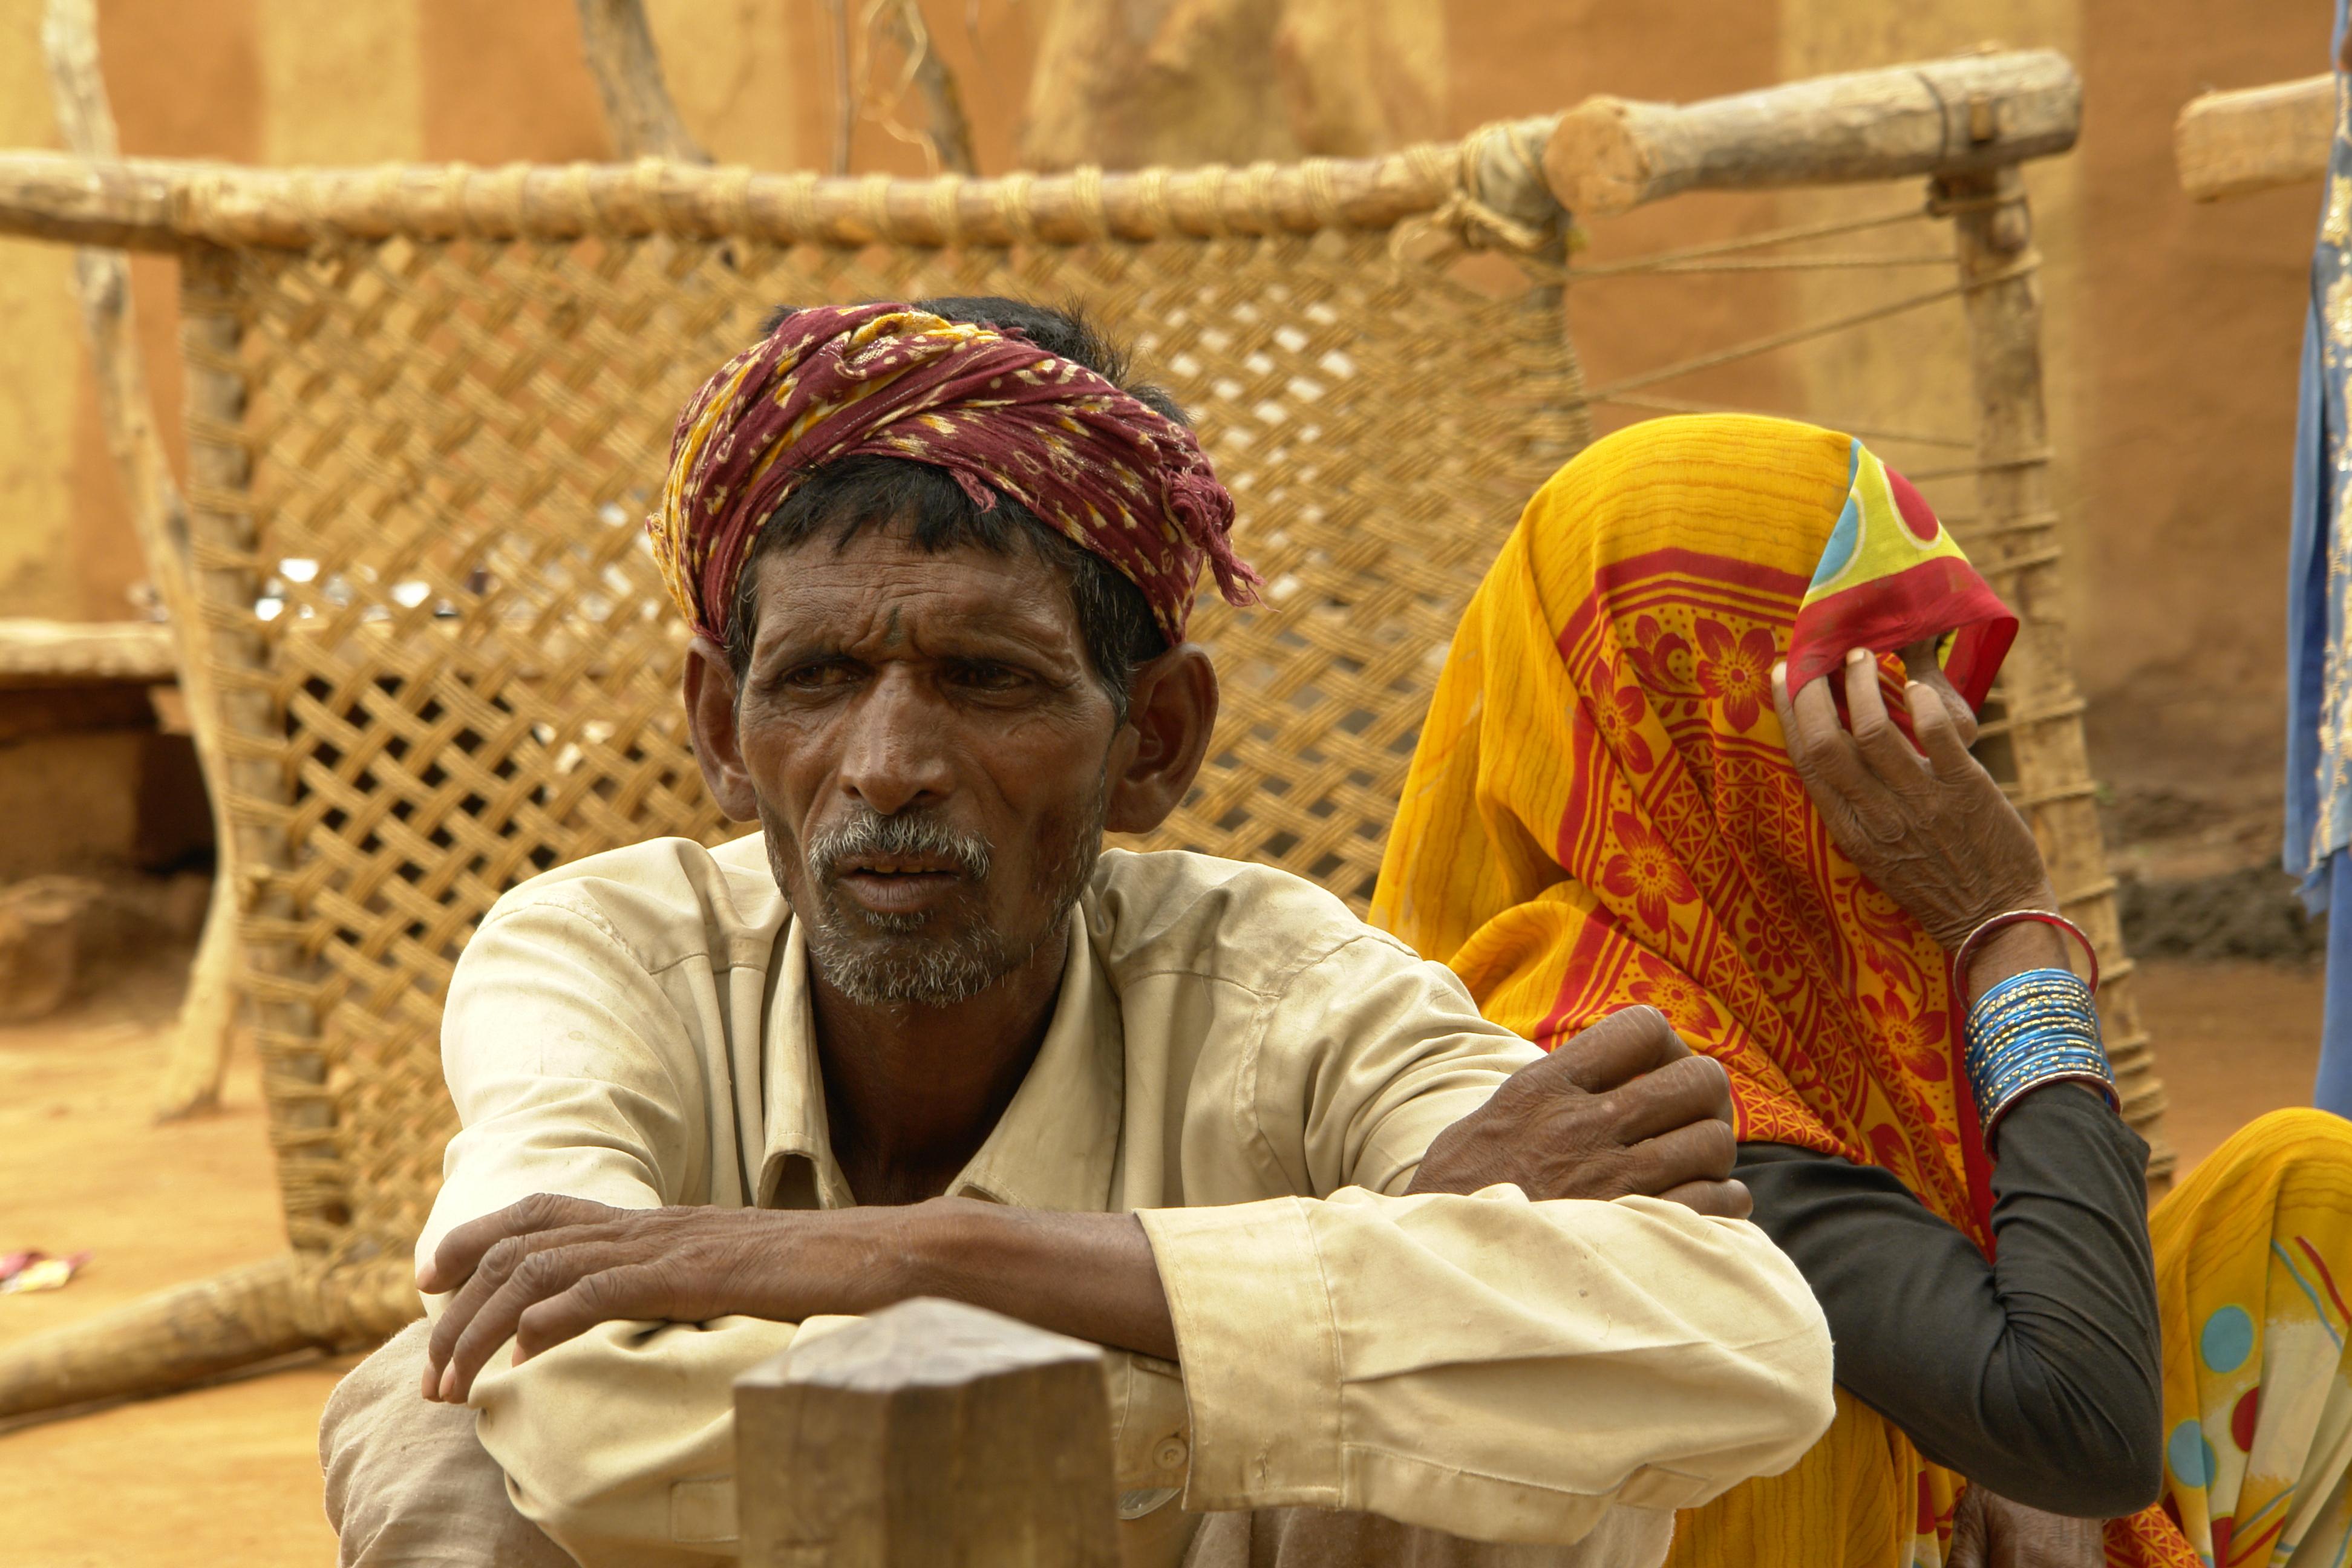 kisan tribe Ethnonyms: dhangad, dhangar, dhanka (farmworker), kisan, kuda, kurukh,  kurunkh, orao, uraon the oraons are one of the largest tribes in south asia,.